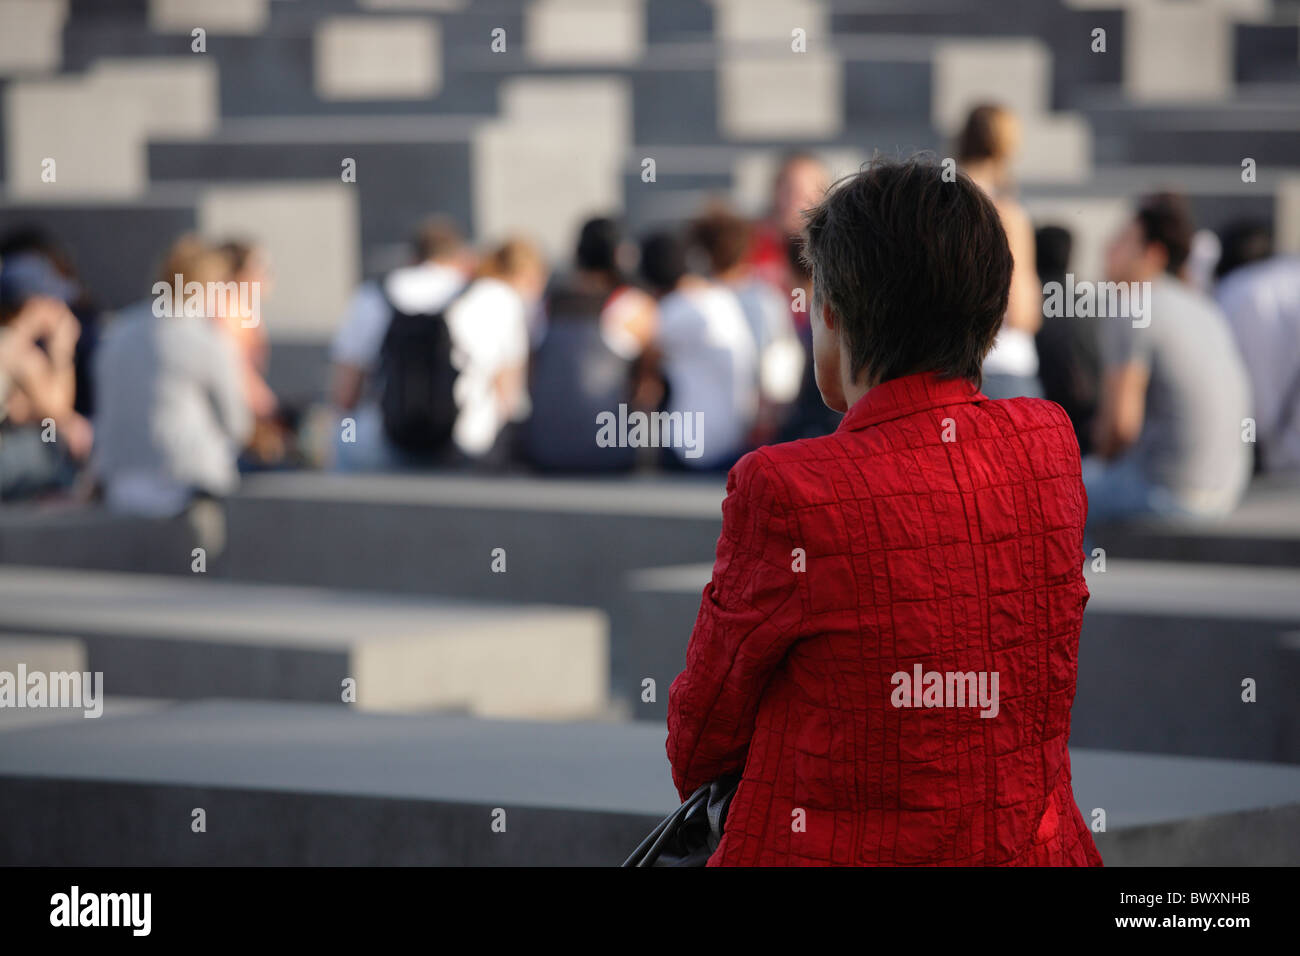 woman at the Memorial to the Murdered Jews of Europe in Berlin, Germany; Denkmal für die ermordeten Juden Europas - Stock Image